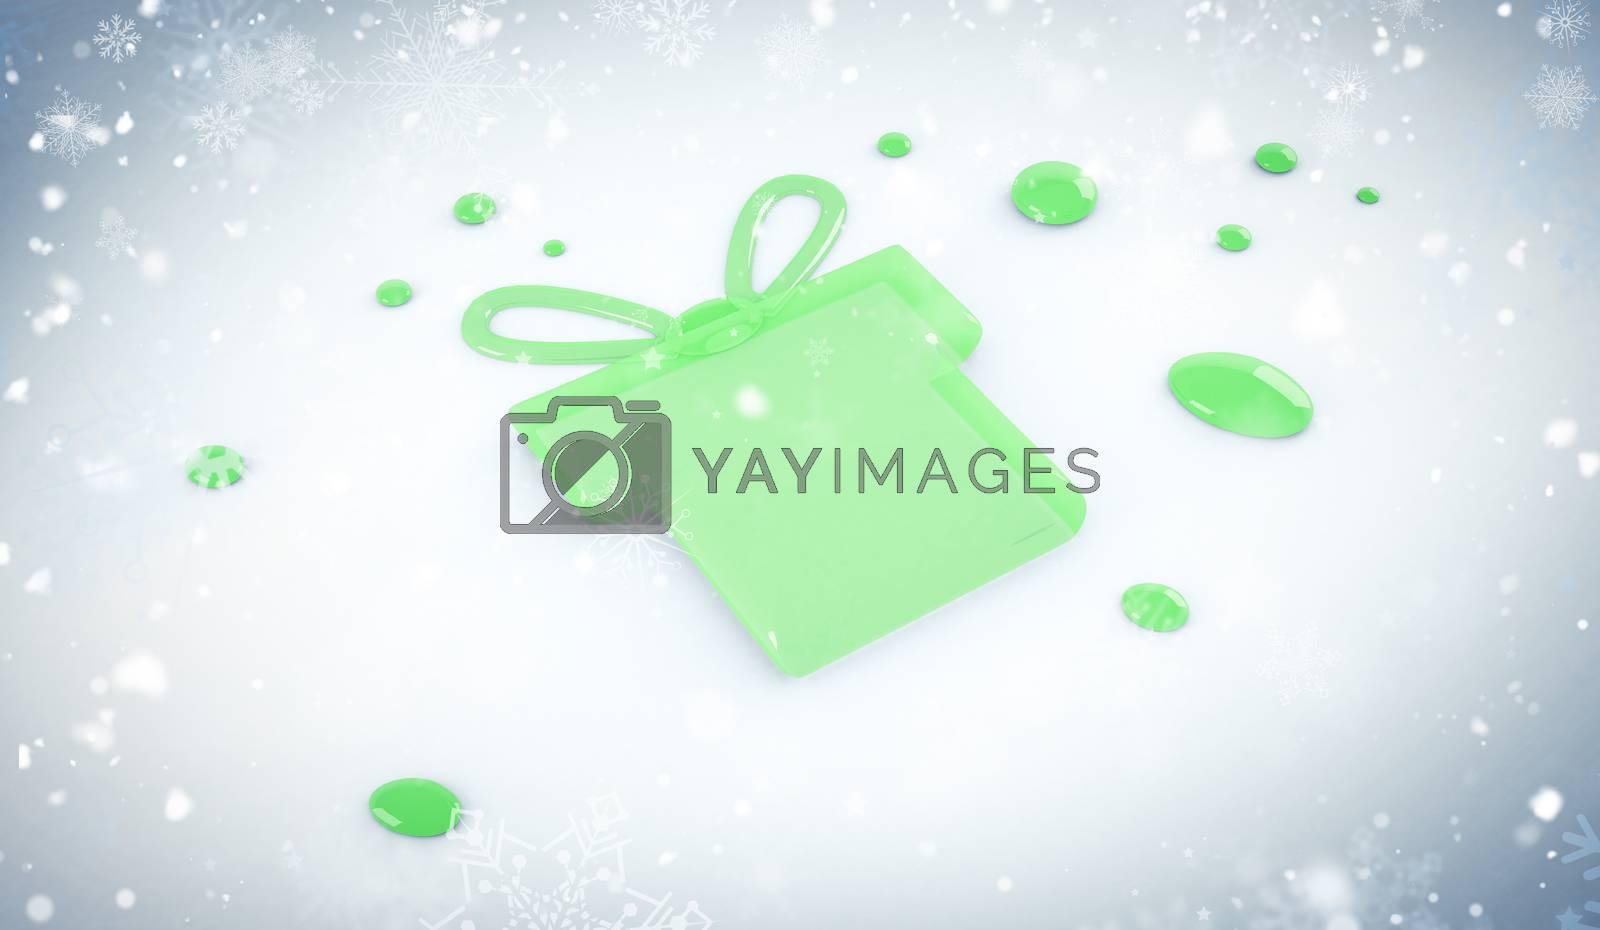 Composite image of snow by Wavebreakmedia